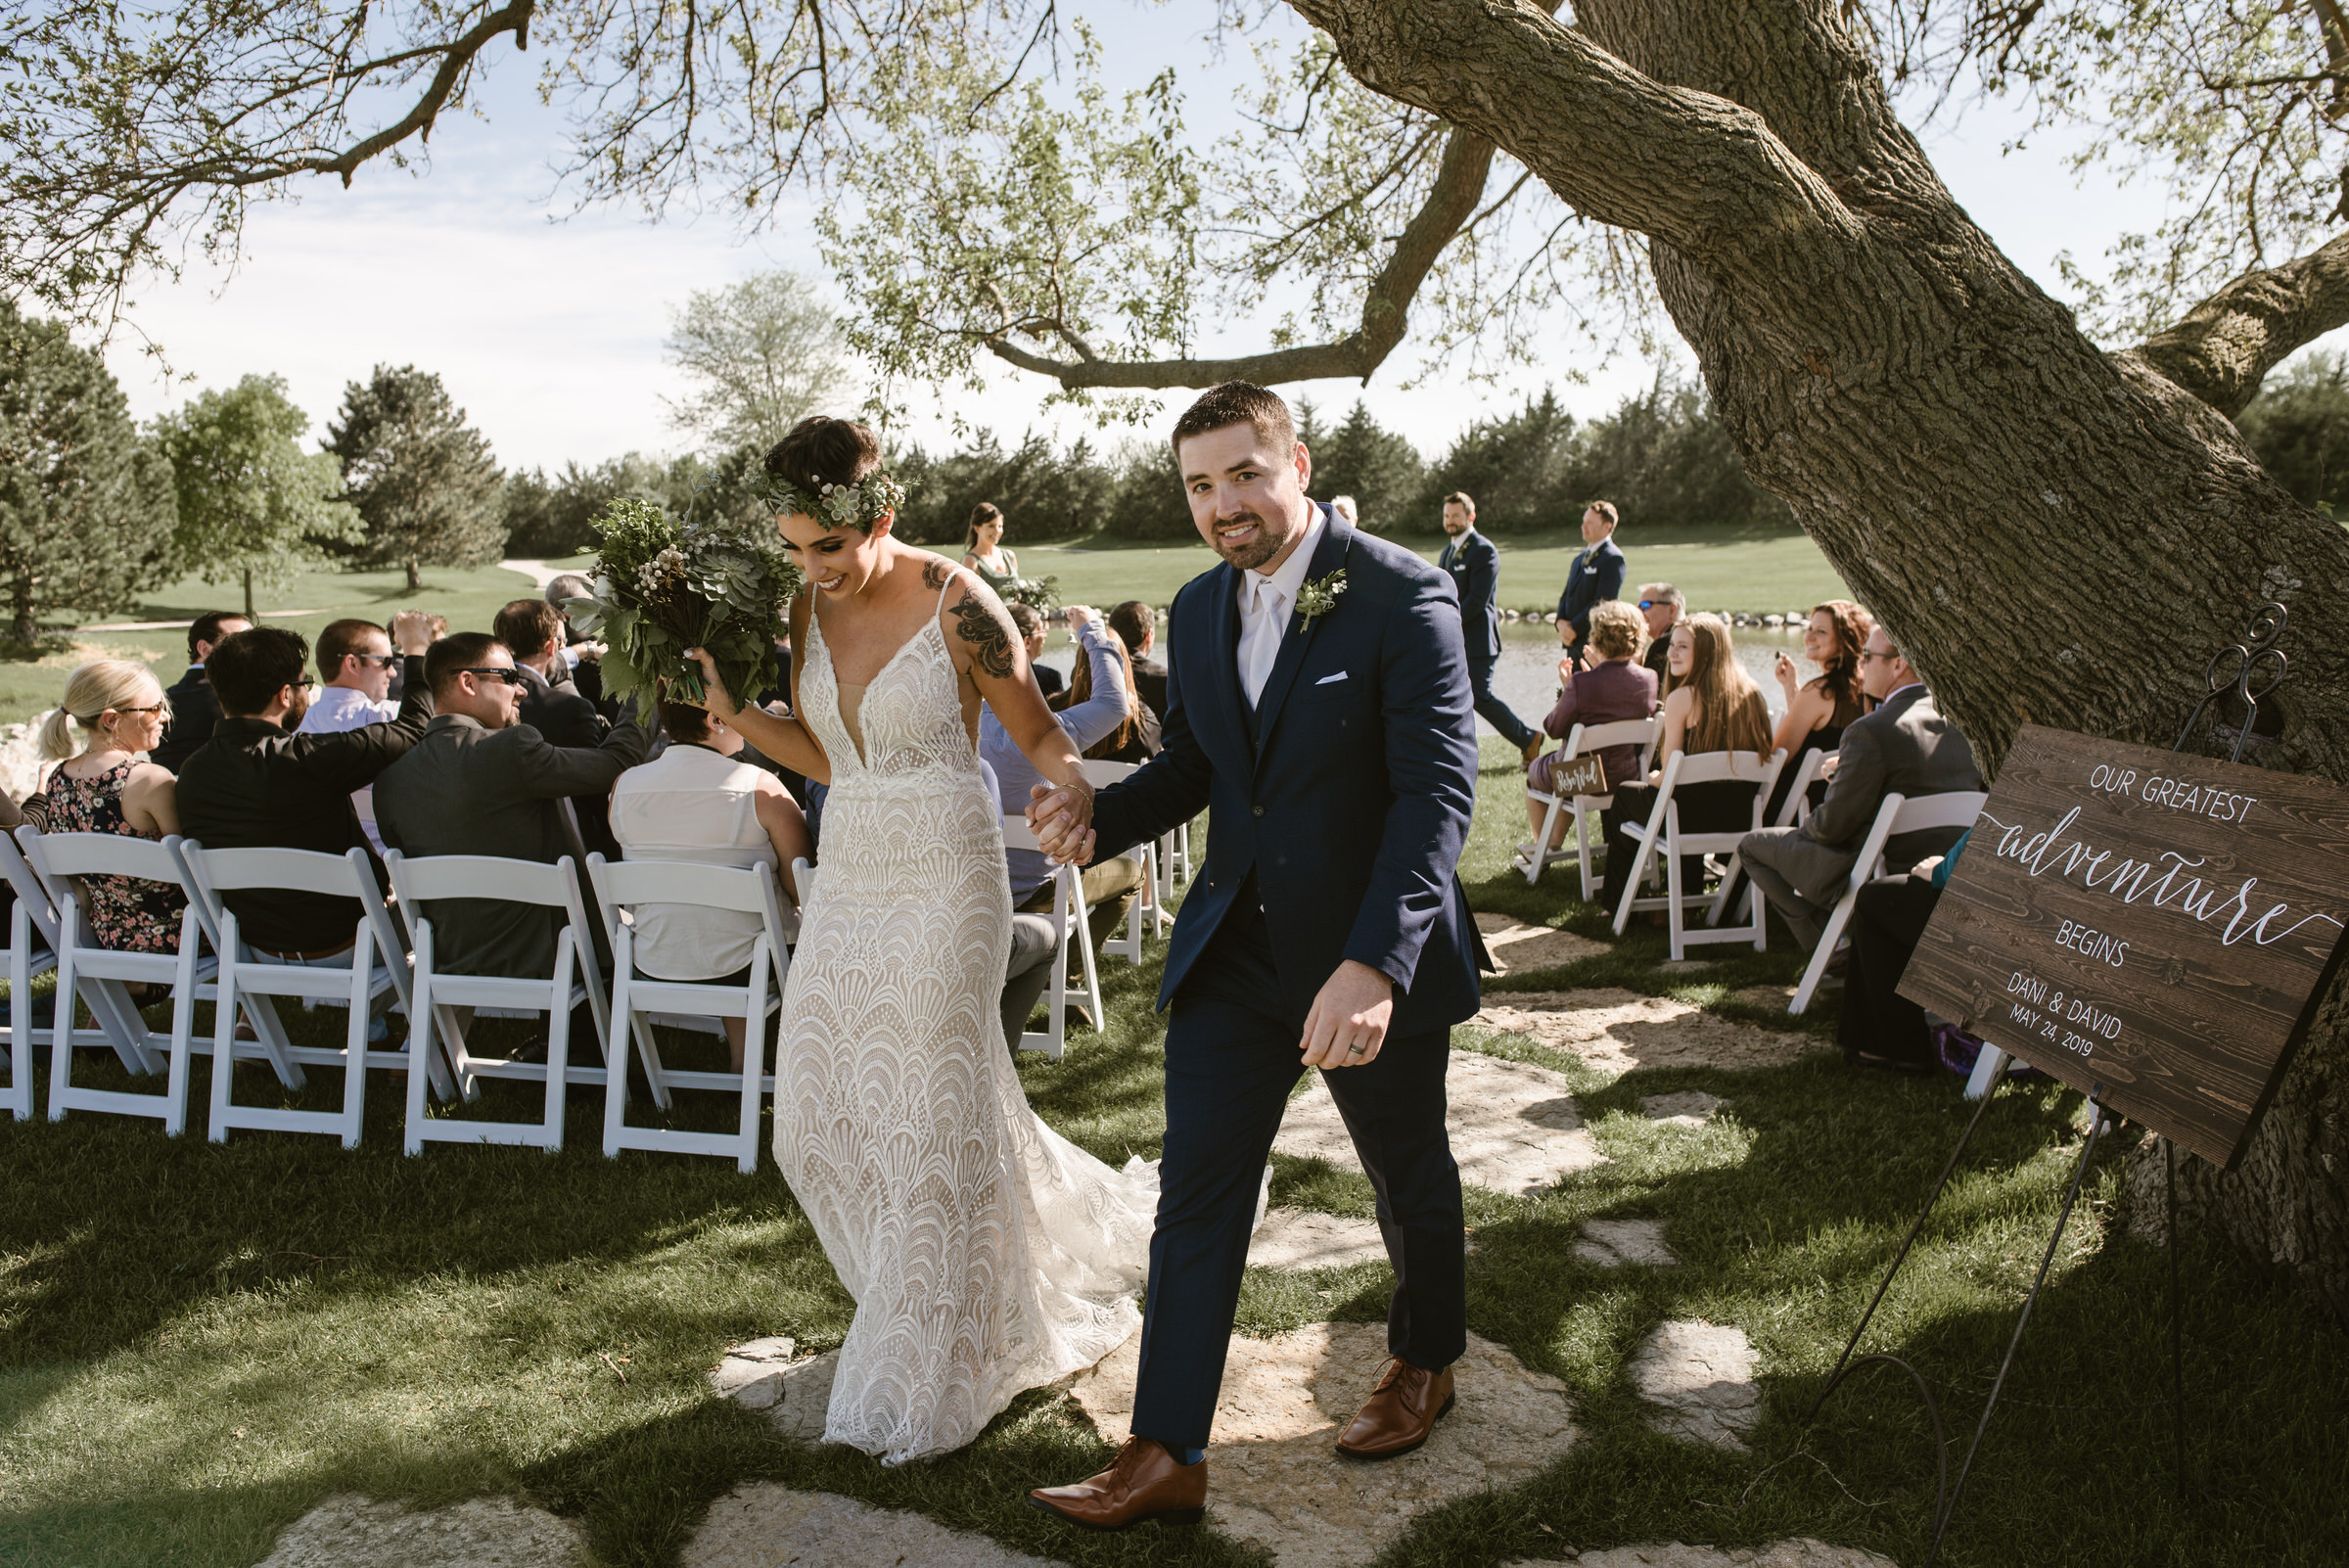 Wilderness-Ridge-Lincoln-Nebraska-Wedding-Kaylie-Sirek-Photography-062.jpg